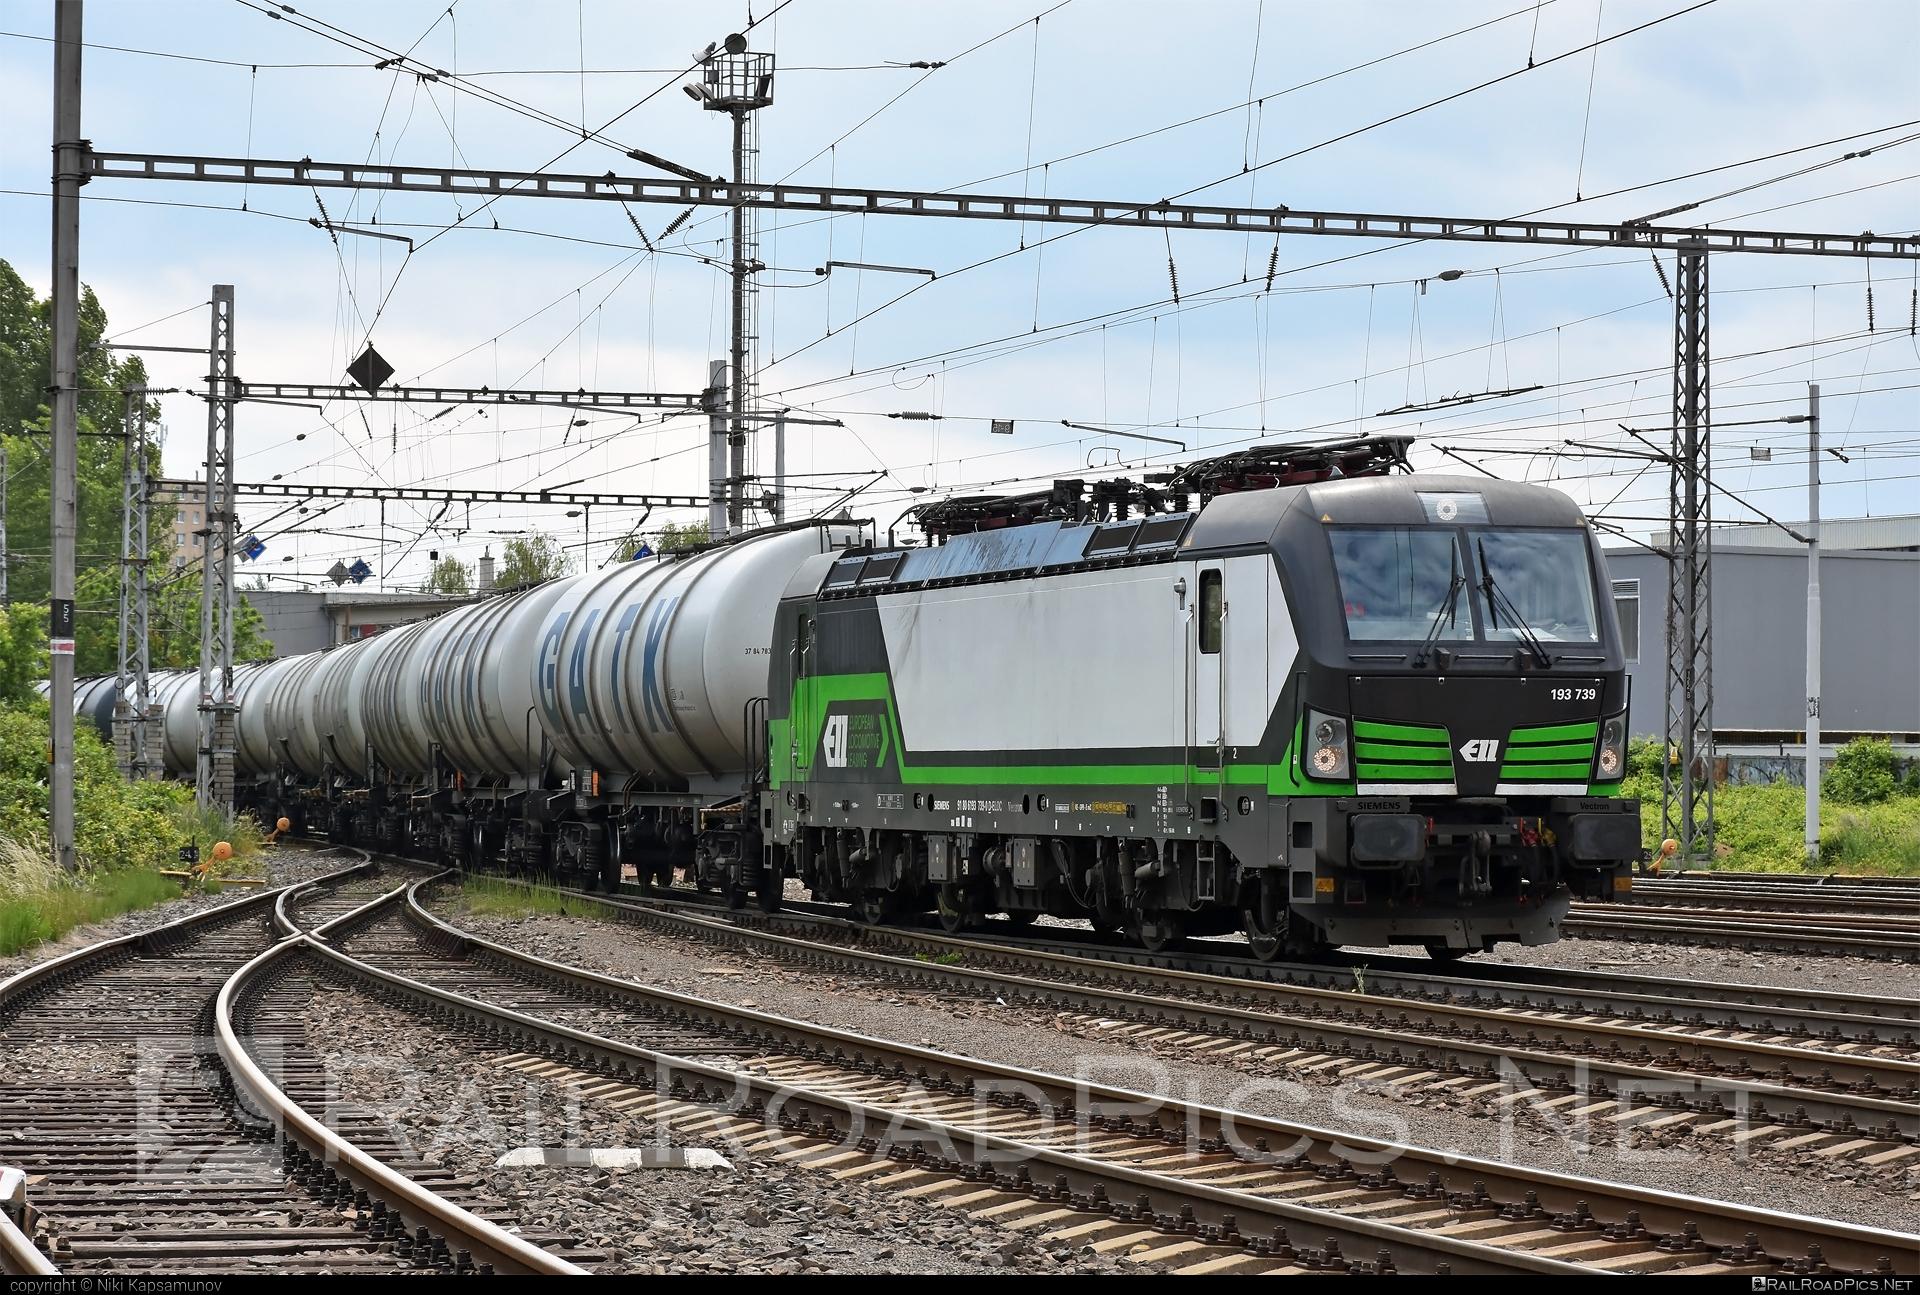 Siemens Vectron MS - 193 739 operated by LTE Logistik und Transport GmbH #ell #ellgermany #eloc #europeanlocomotiveleasing #gatx #kesselwagen #lte #ltelogistikundtransport #ltelogistikundtransportgmbh #siemens #siemensvectron #siemensvectronms #tankwagon #vectron #vectronms